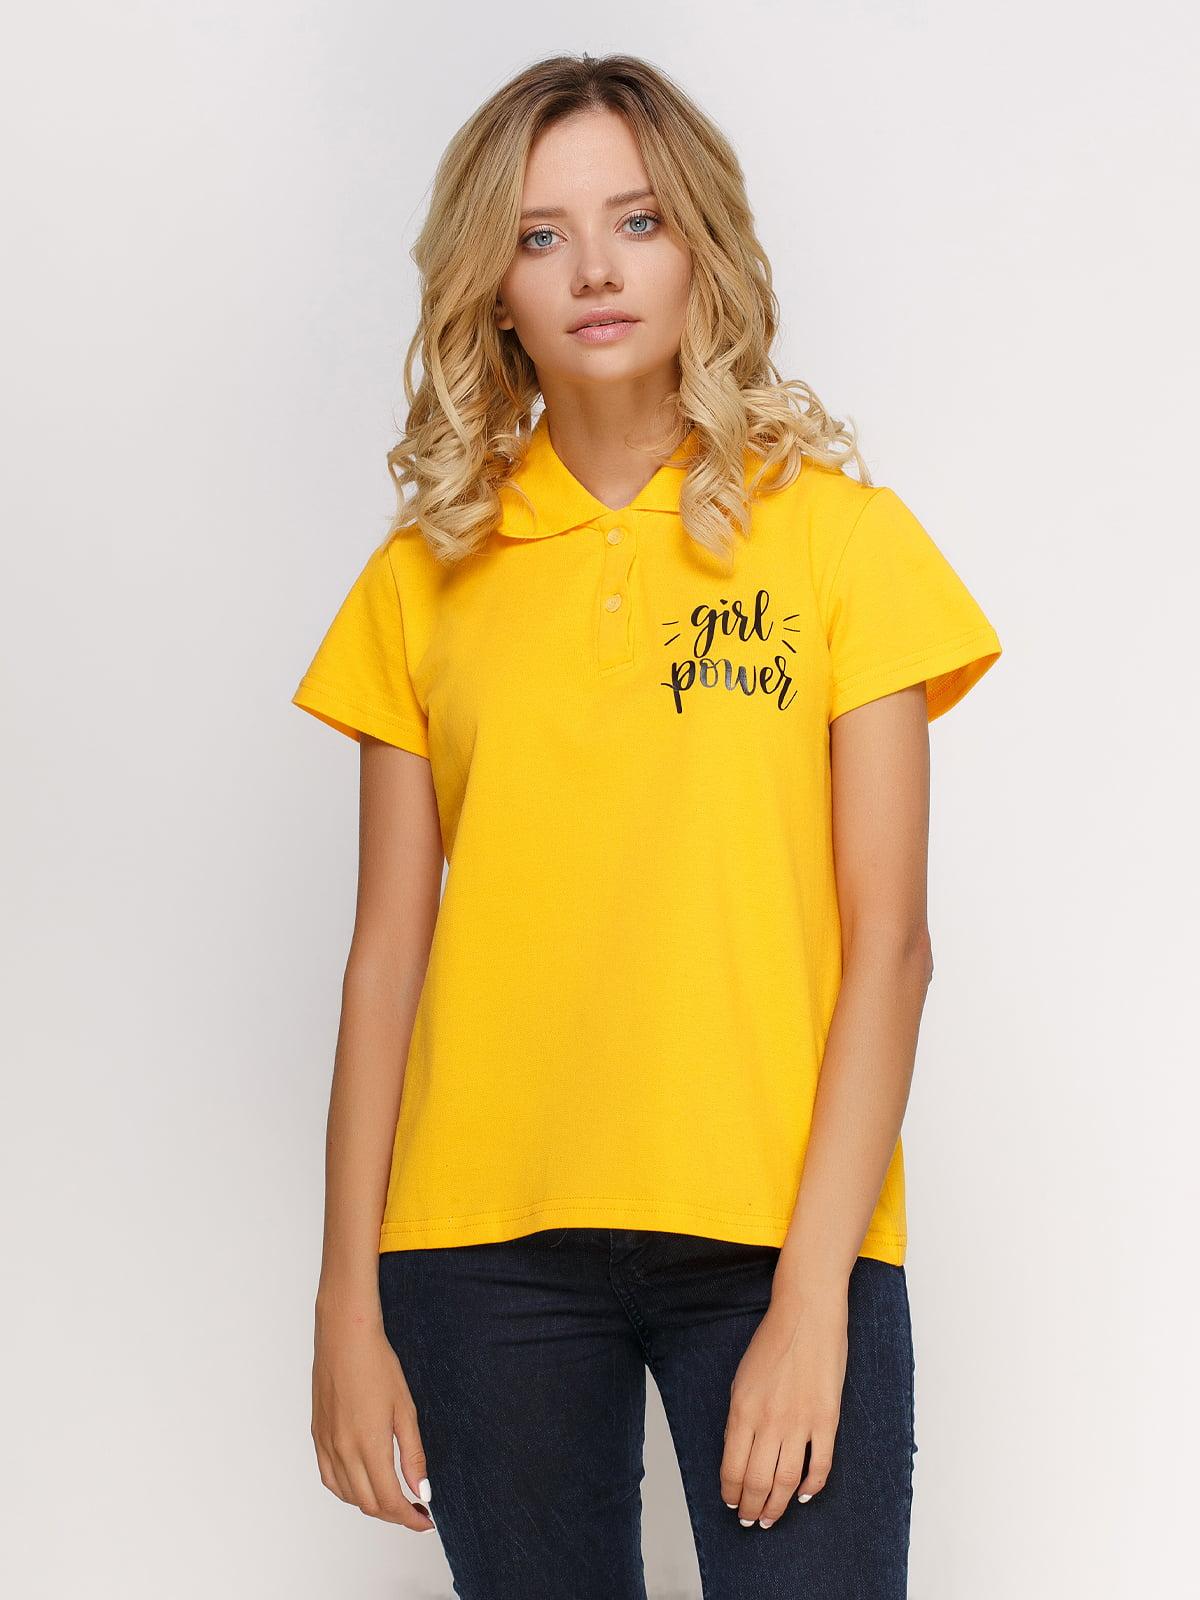 Футболка-поло жовта з принтом | 4578610